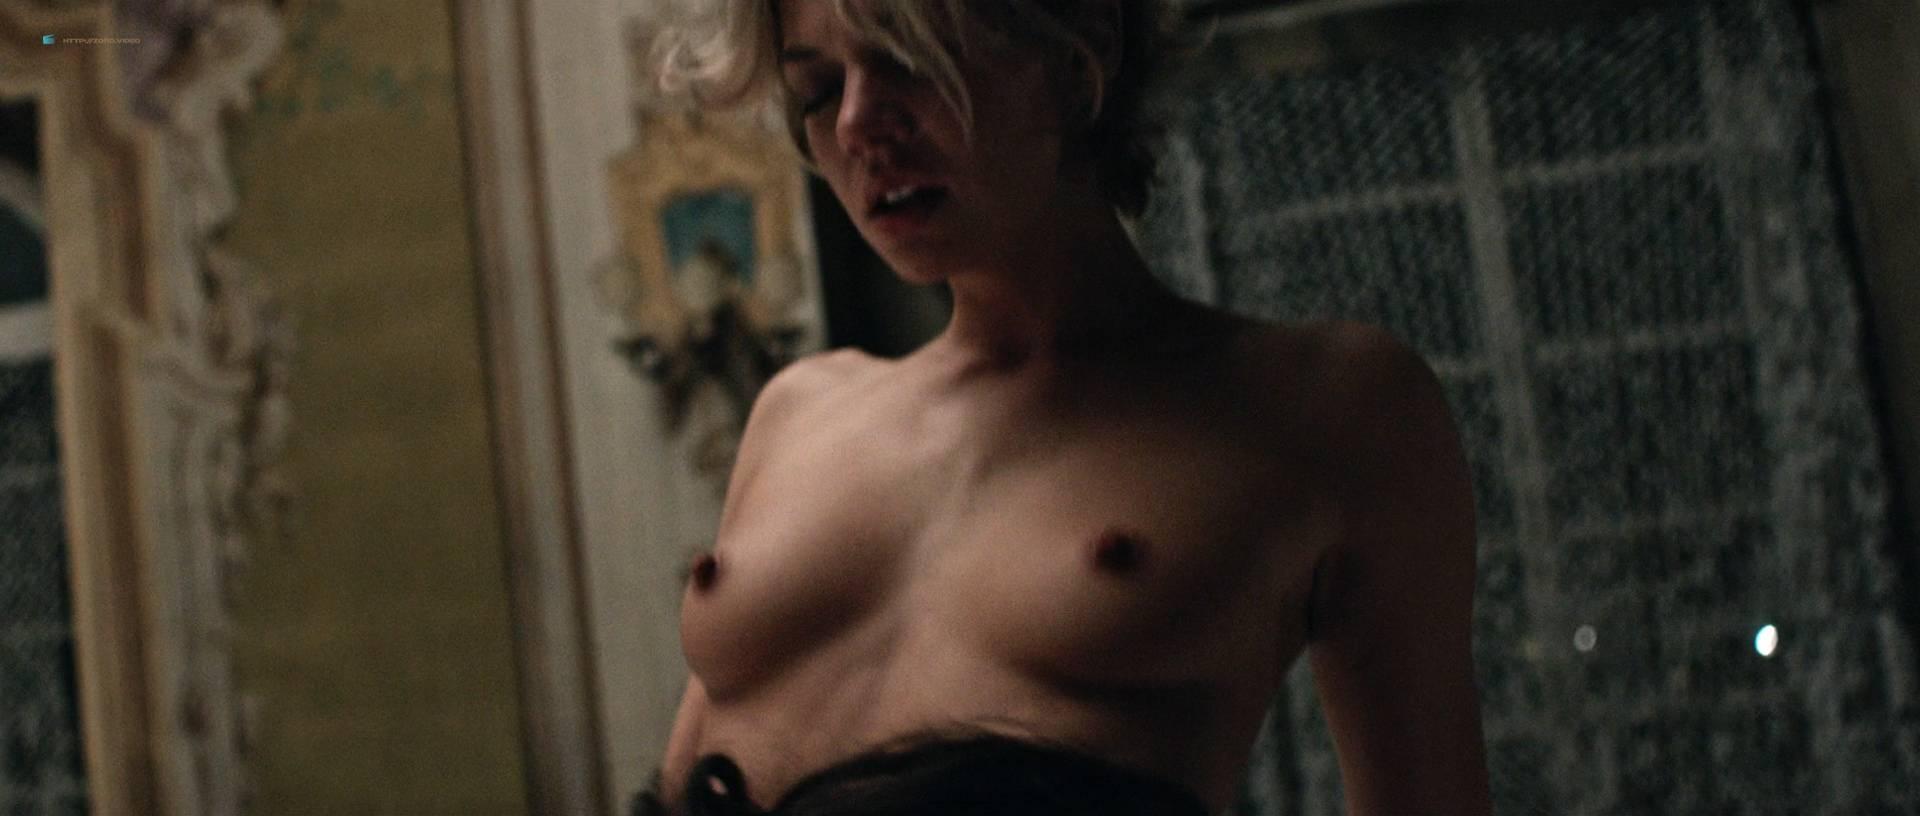 Analeigh Tipton Tits